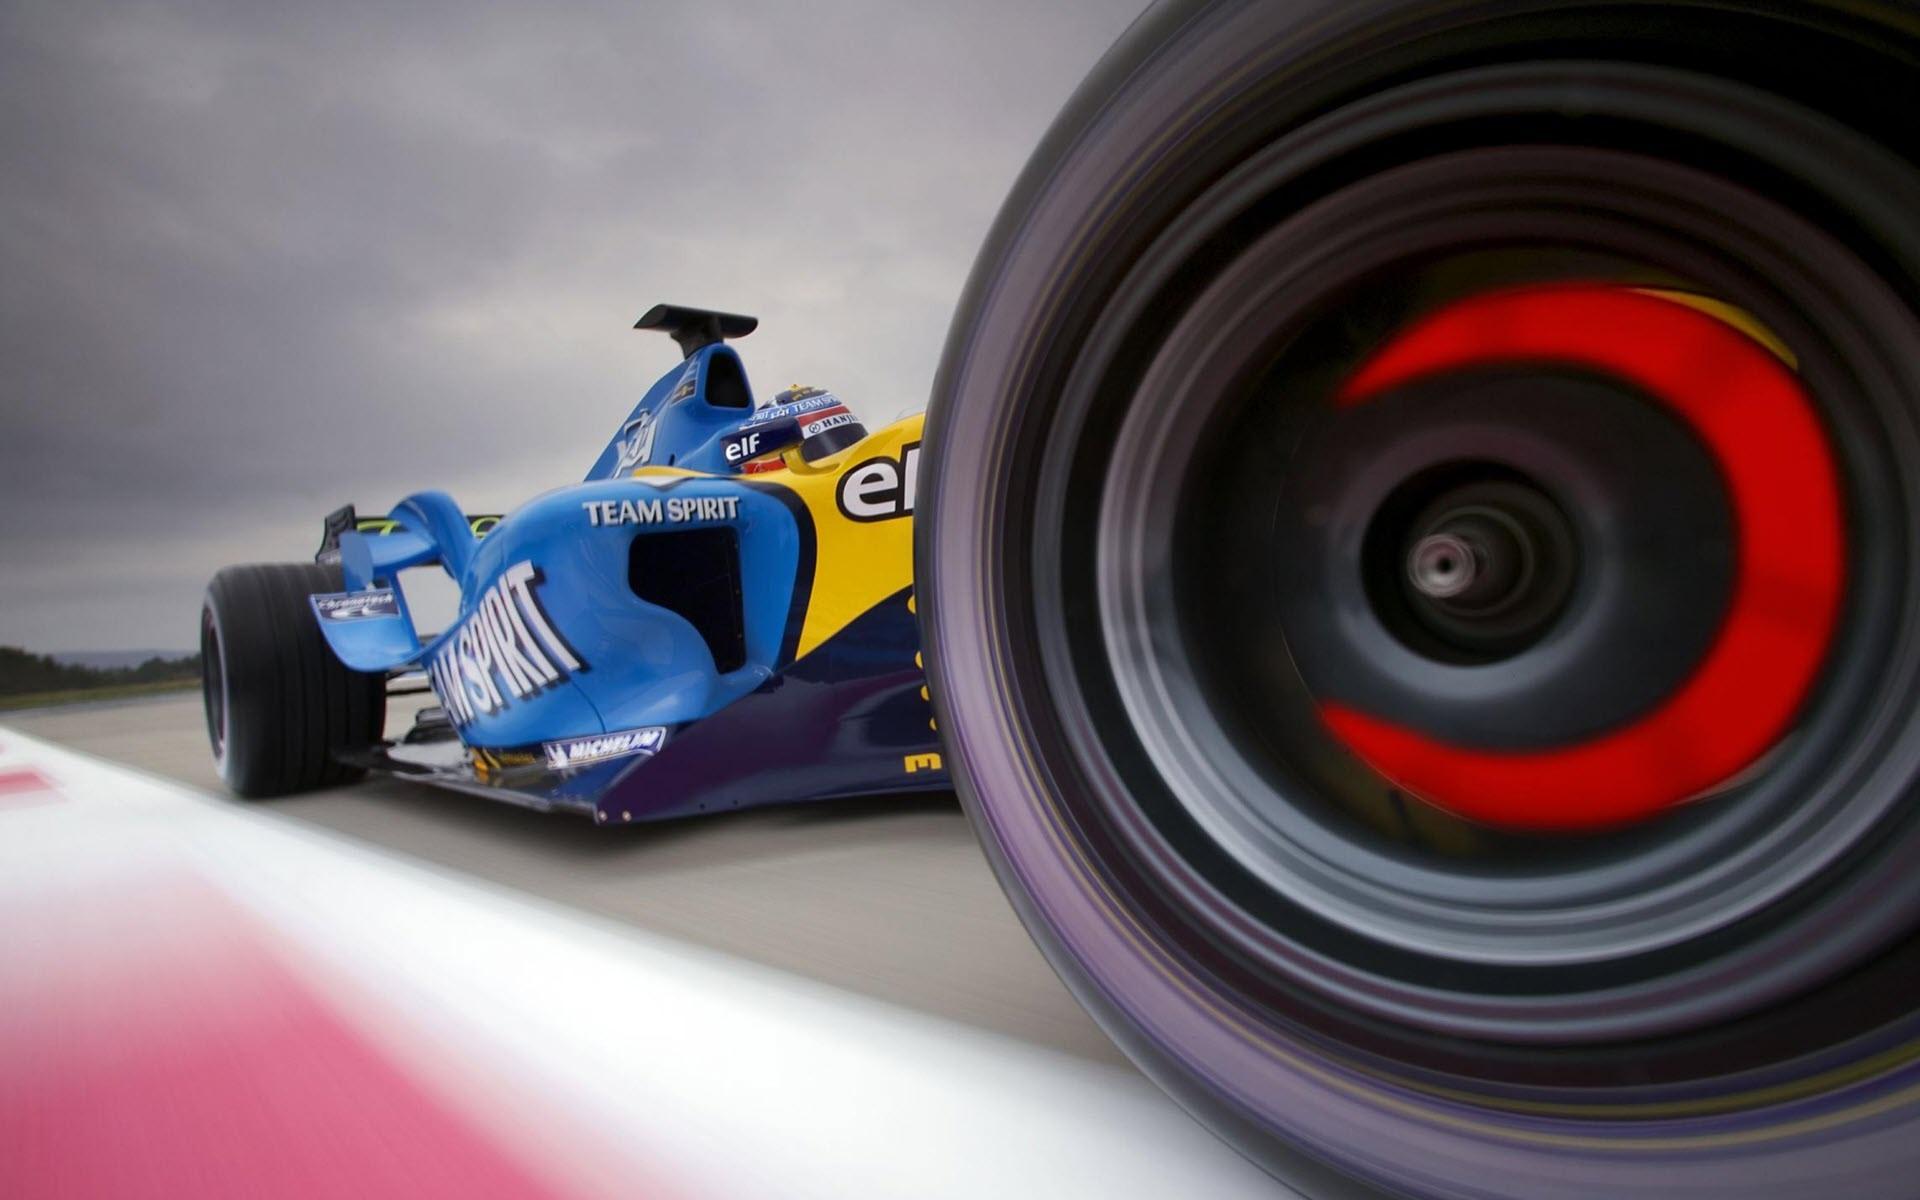 Team Spirit Formula 1 desktop wallpaper 1920x1200